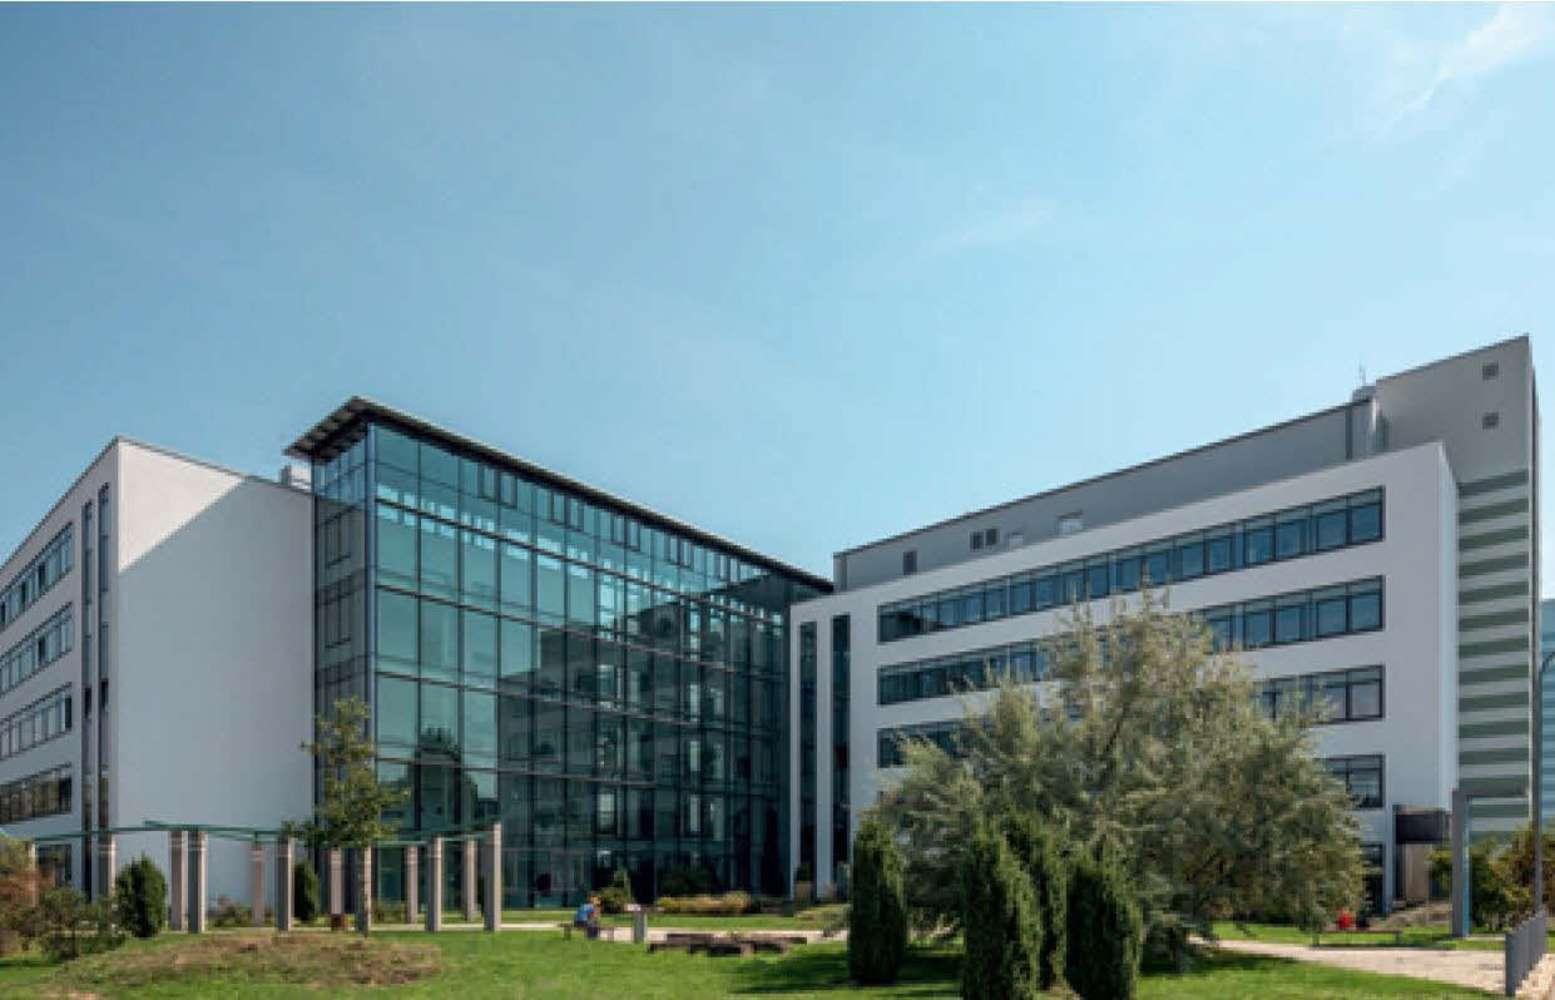 Büros Frankfurt am main, 65926 - Büro - Frankfurt am Main, Höchst - F2035 - 9412514